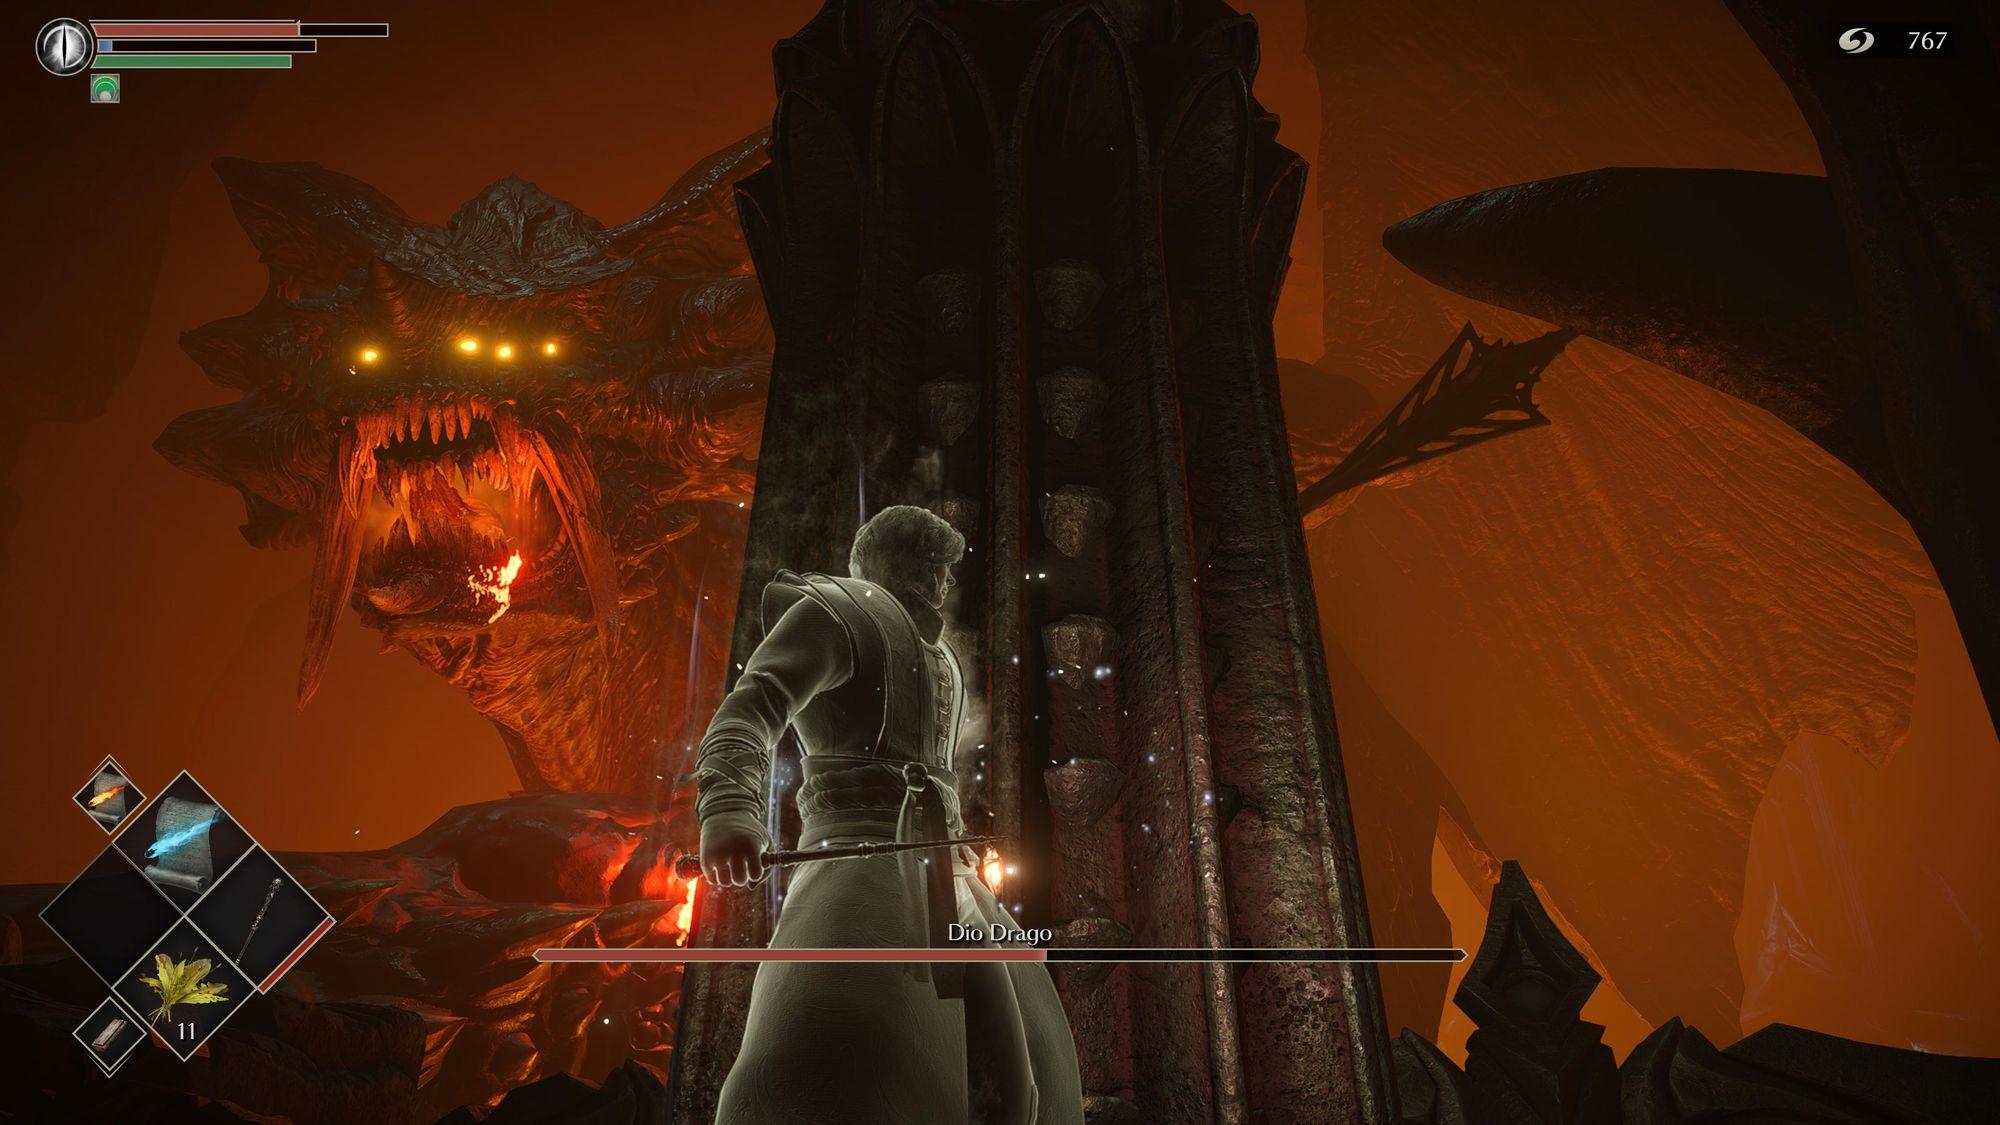 Drago divino, Demon's Souls